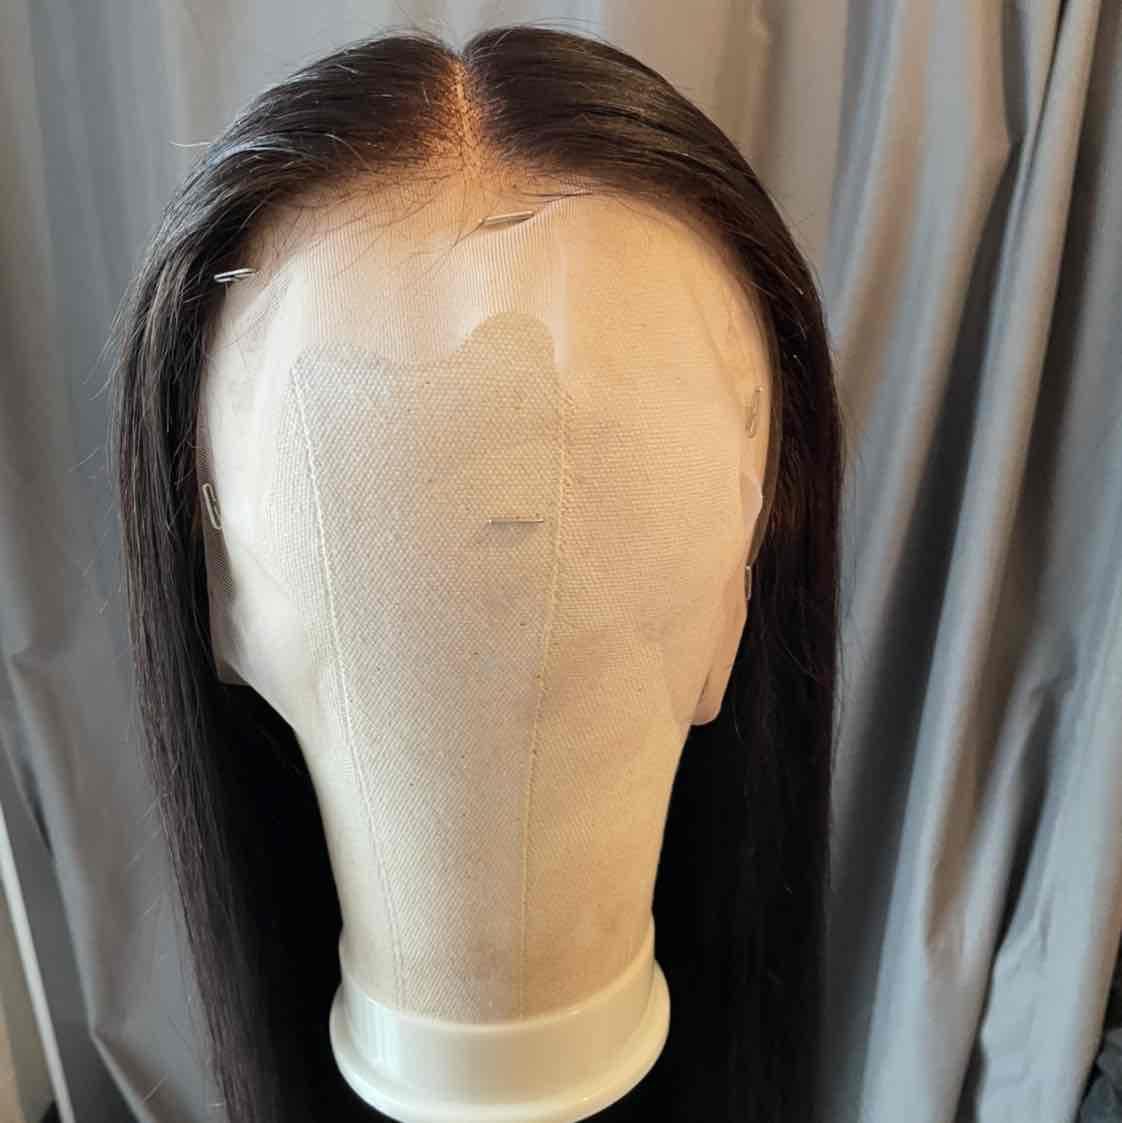 salon de coiffure afro tresse tresses box braids crochet braids vanilles tissages paris 75 77 78 91 92 93 94 95 QODJFWKK